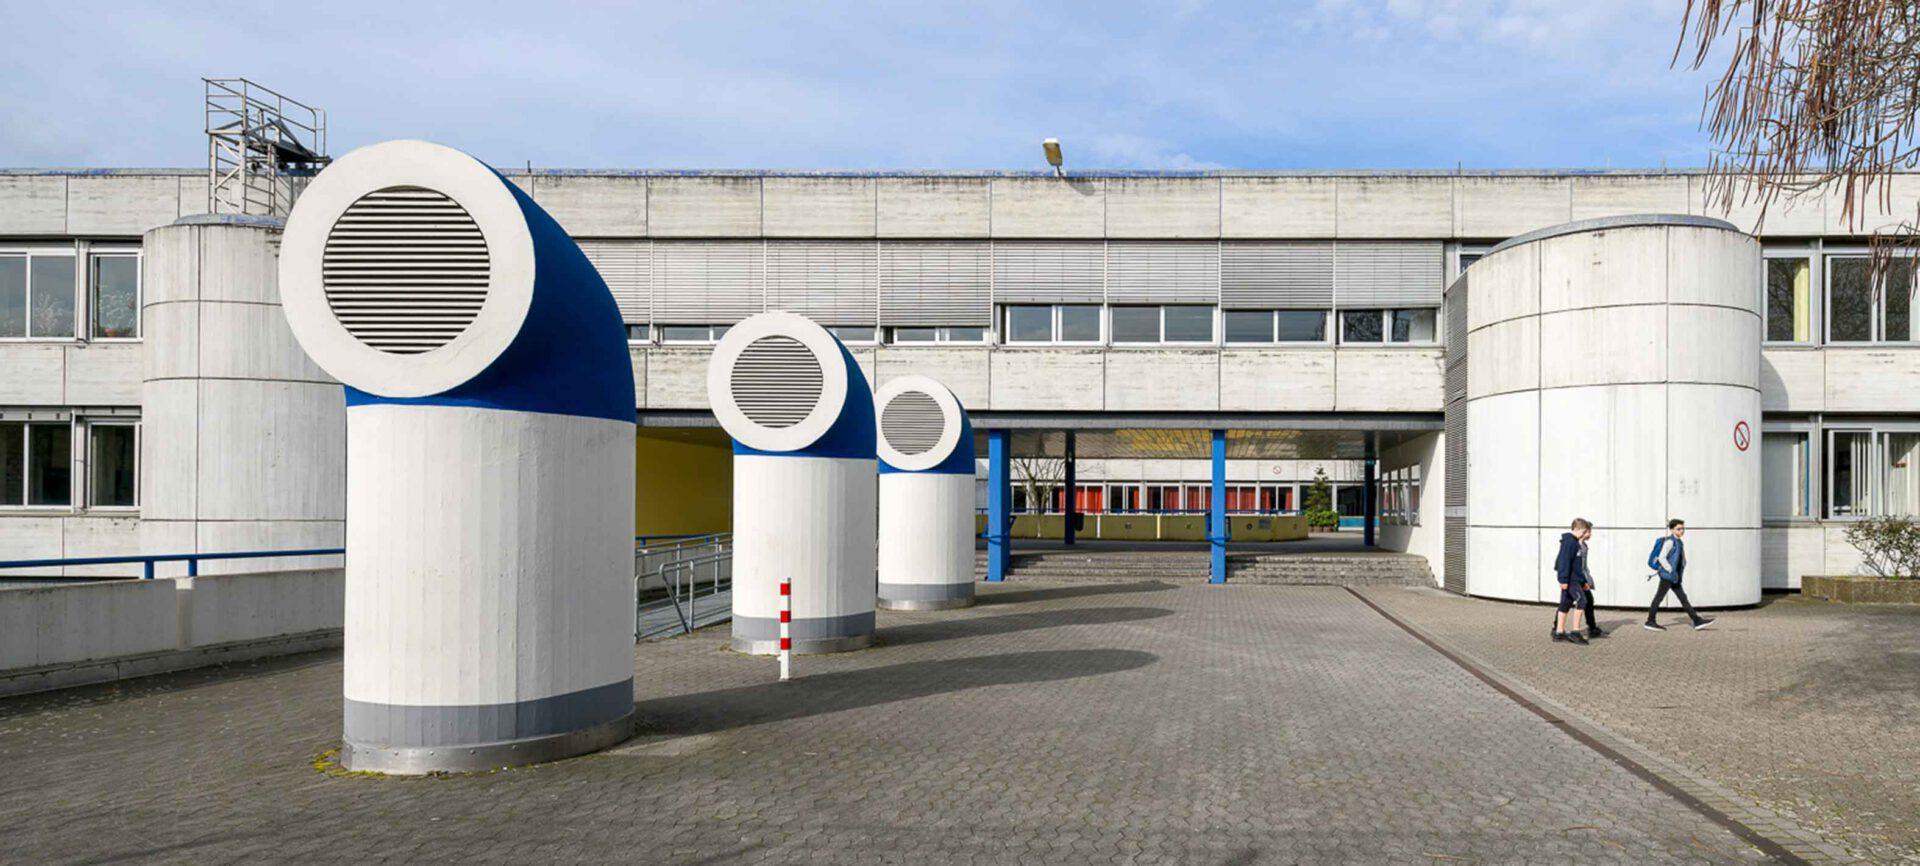 Kunst am Bau am Friederich-Rückert-Gymnasium